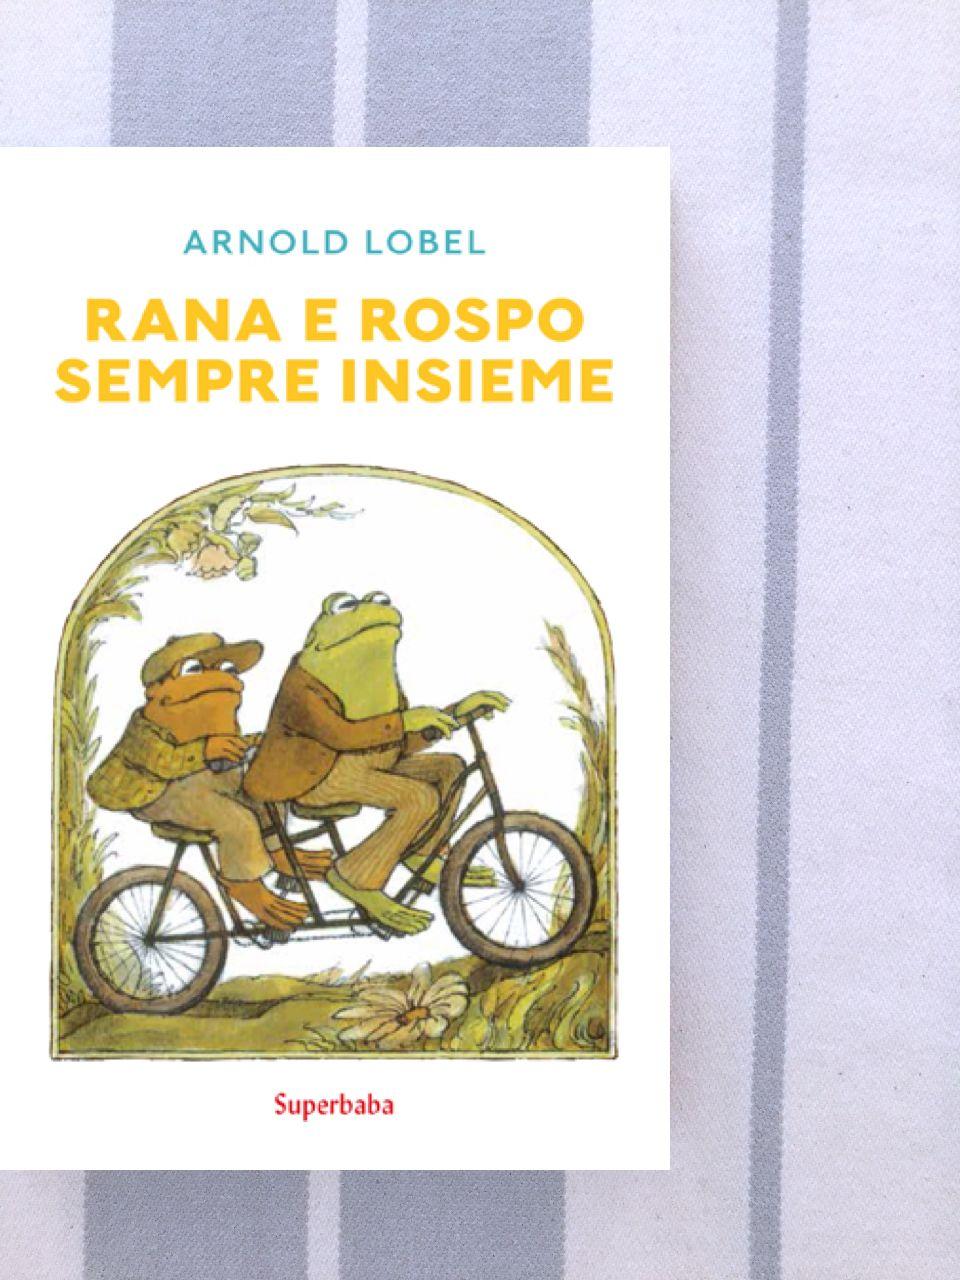 Arnold Lobel, Rana e Rospo sempre insieme, Babalibri